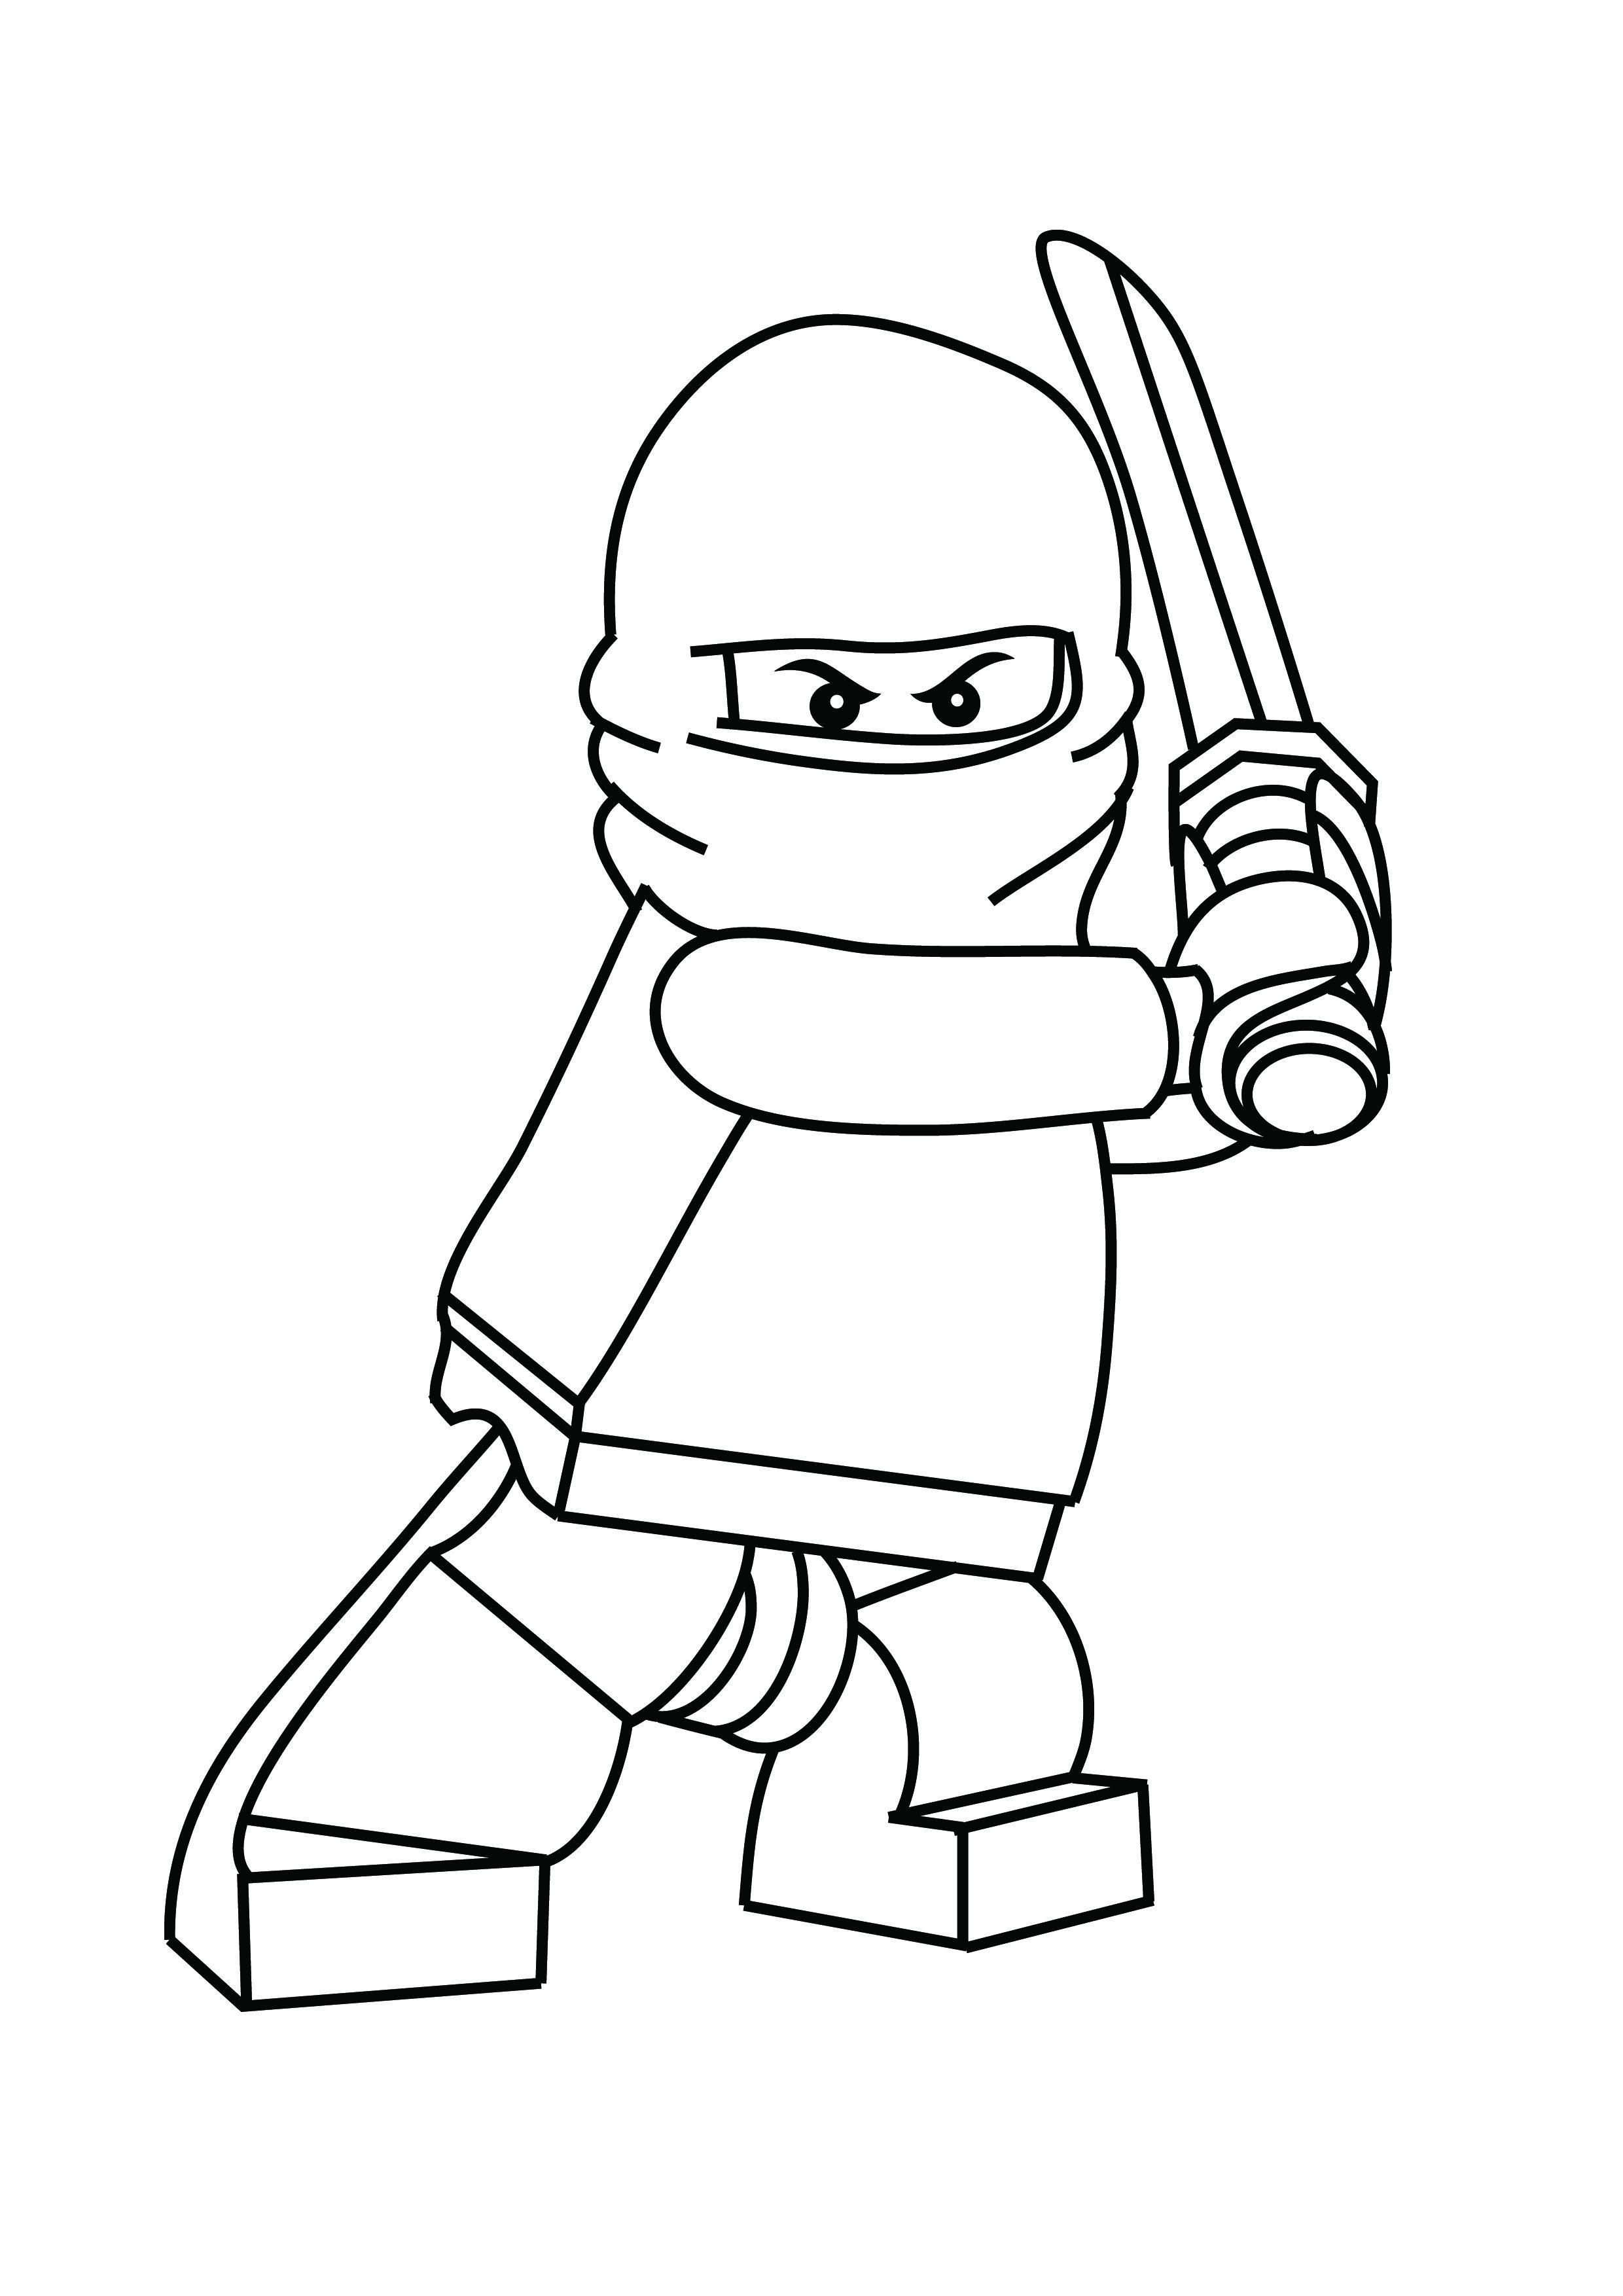 Free Printable Ninjago Coloring Pages For Kids Kleurplaten Lego